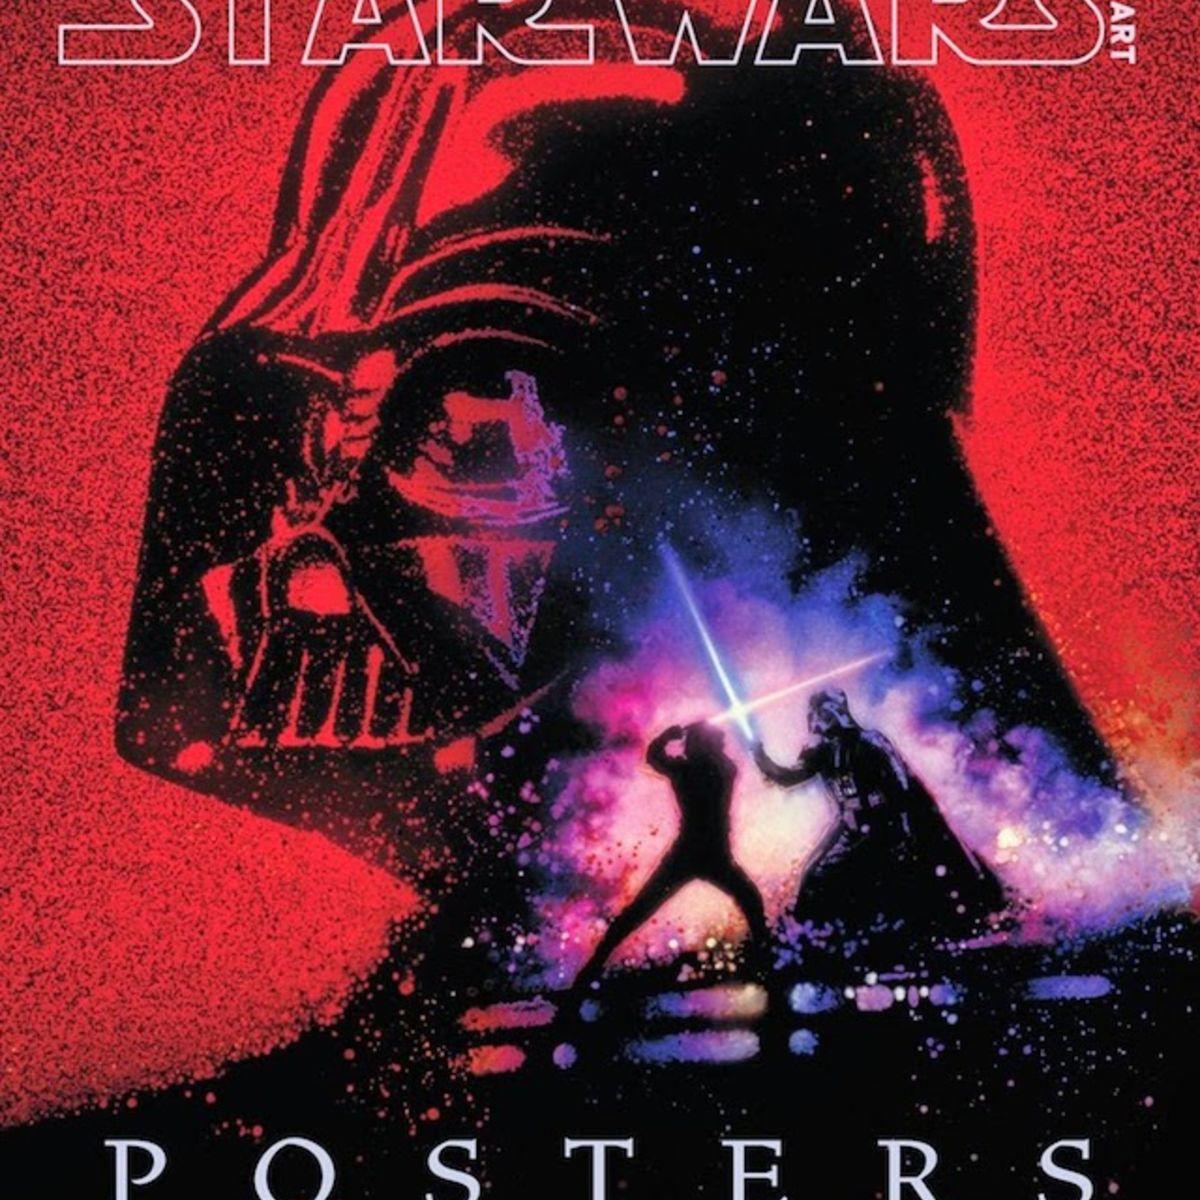 star wars art posters cover.jpg